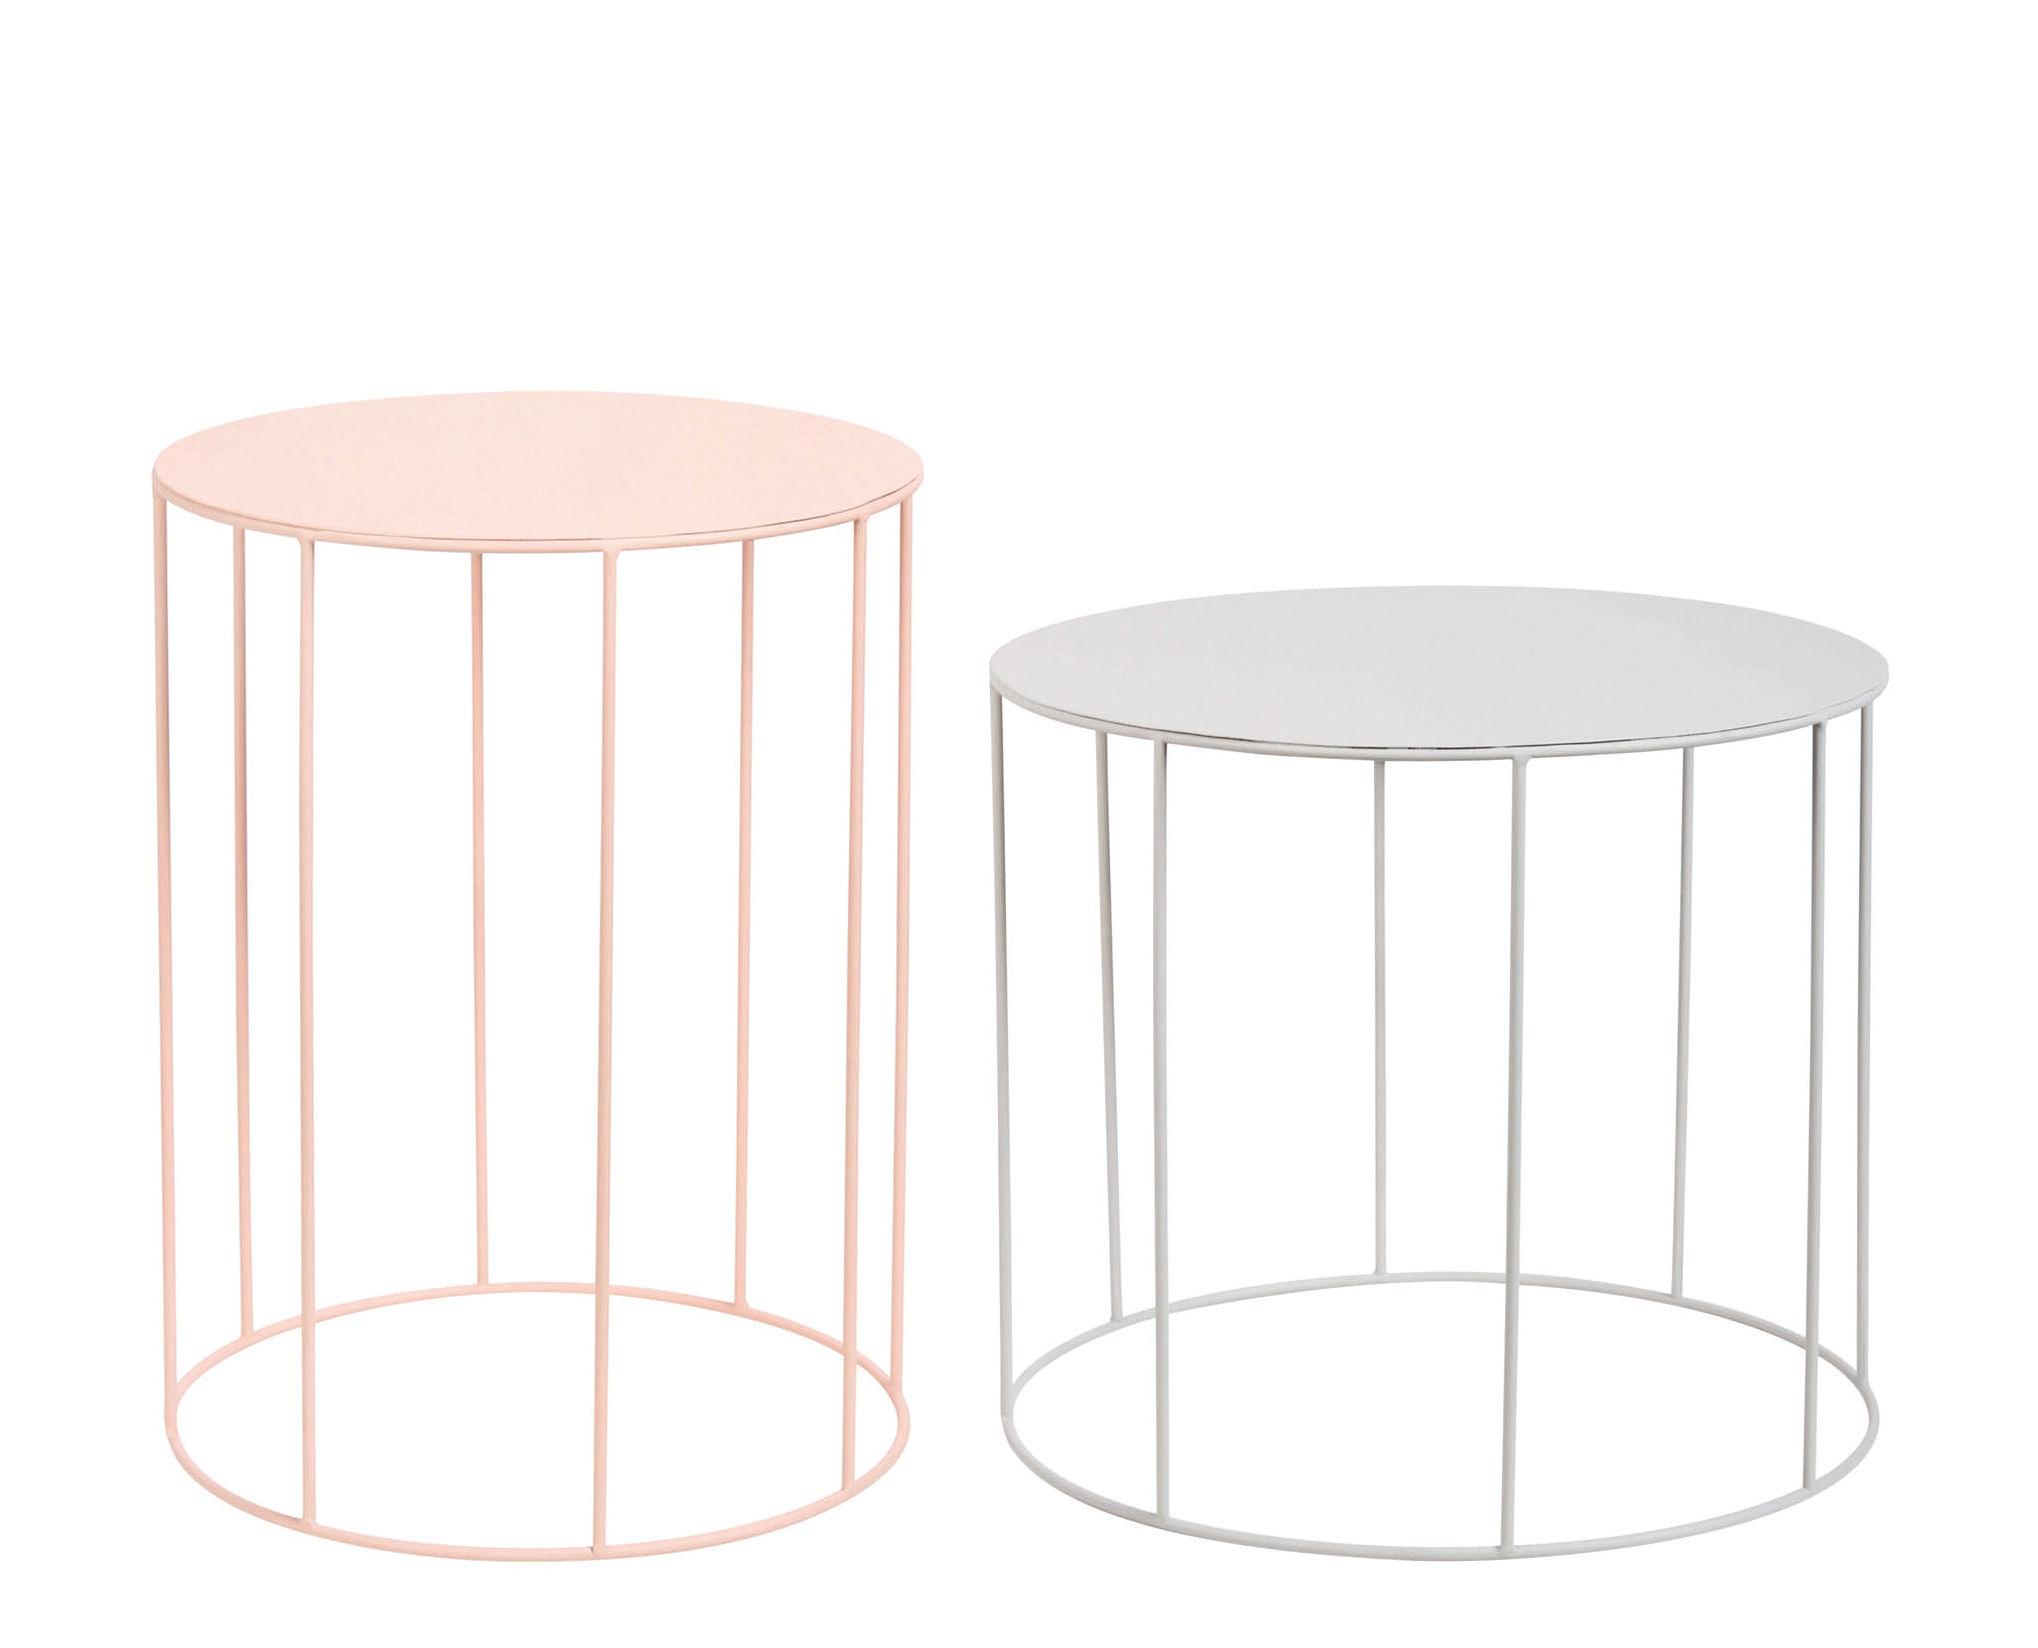 Arredamento - Tavolini  - Tavolino - / Set da 2 - Metallo di & klevering - Grigio / Rosa - metallo verniciato